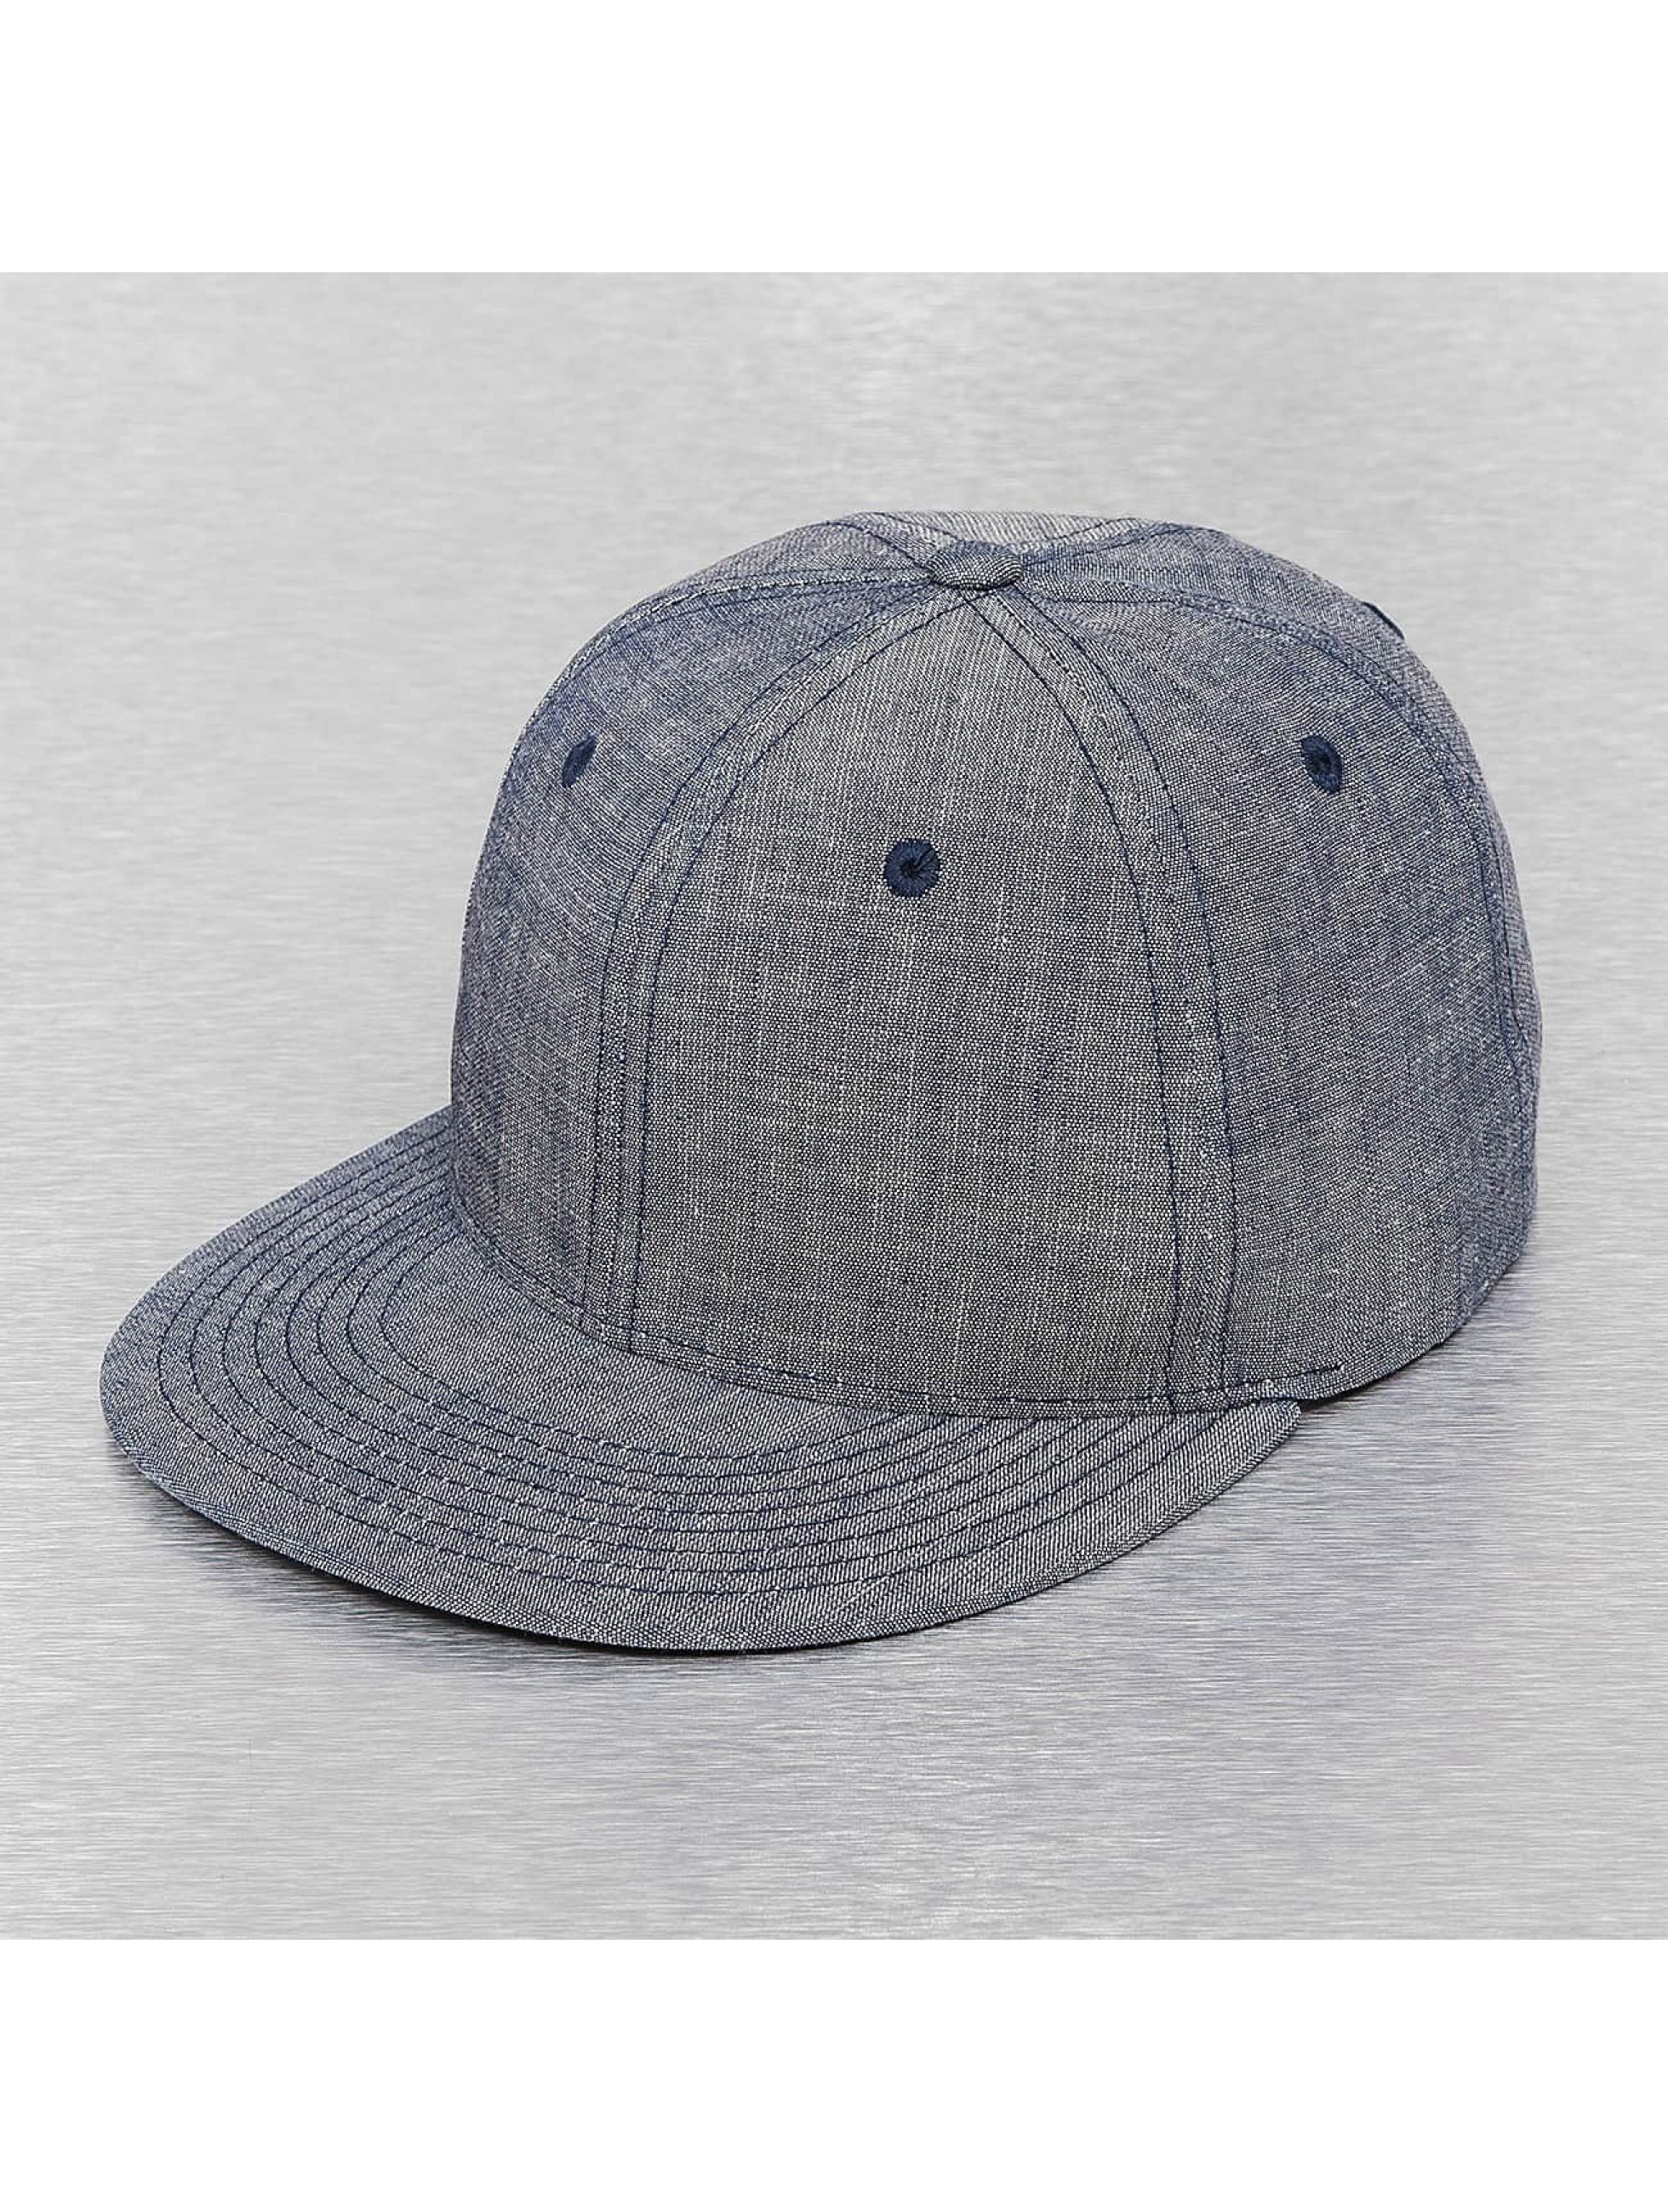 Cap Crony Casquette Snapback & Strapback Washed Denim bleu